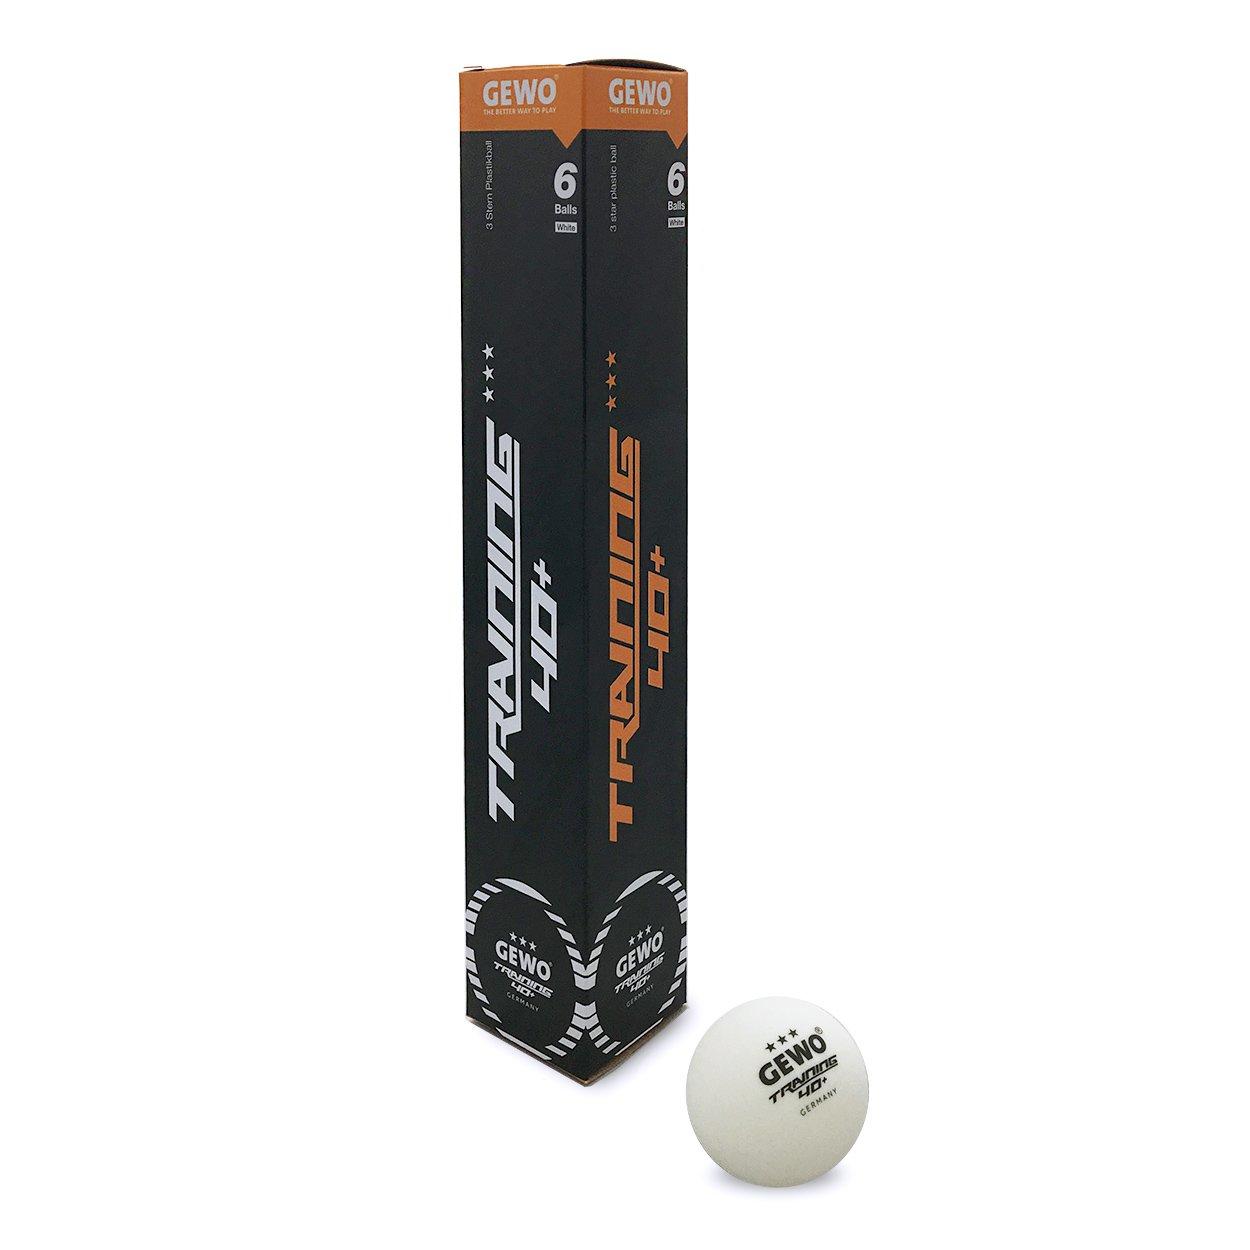 GEWO Trainingsball *** 40+ 6er Weiß GEWO6|#GEWO 85921200